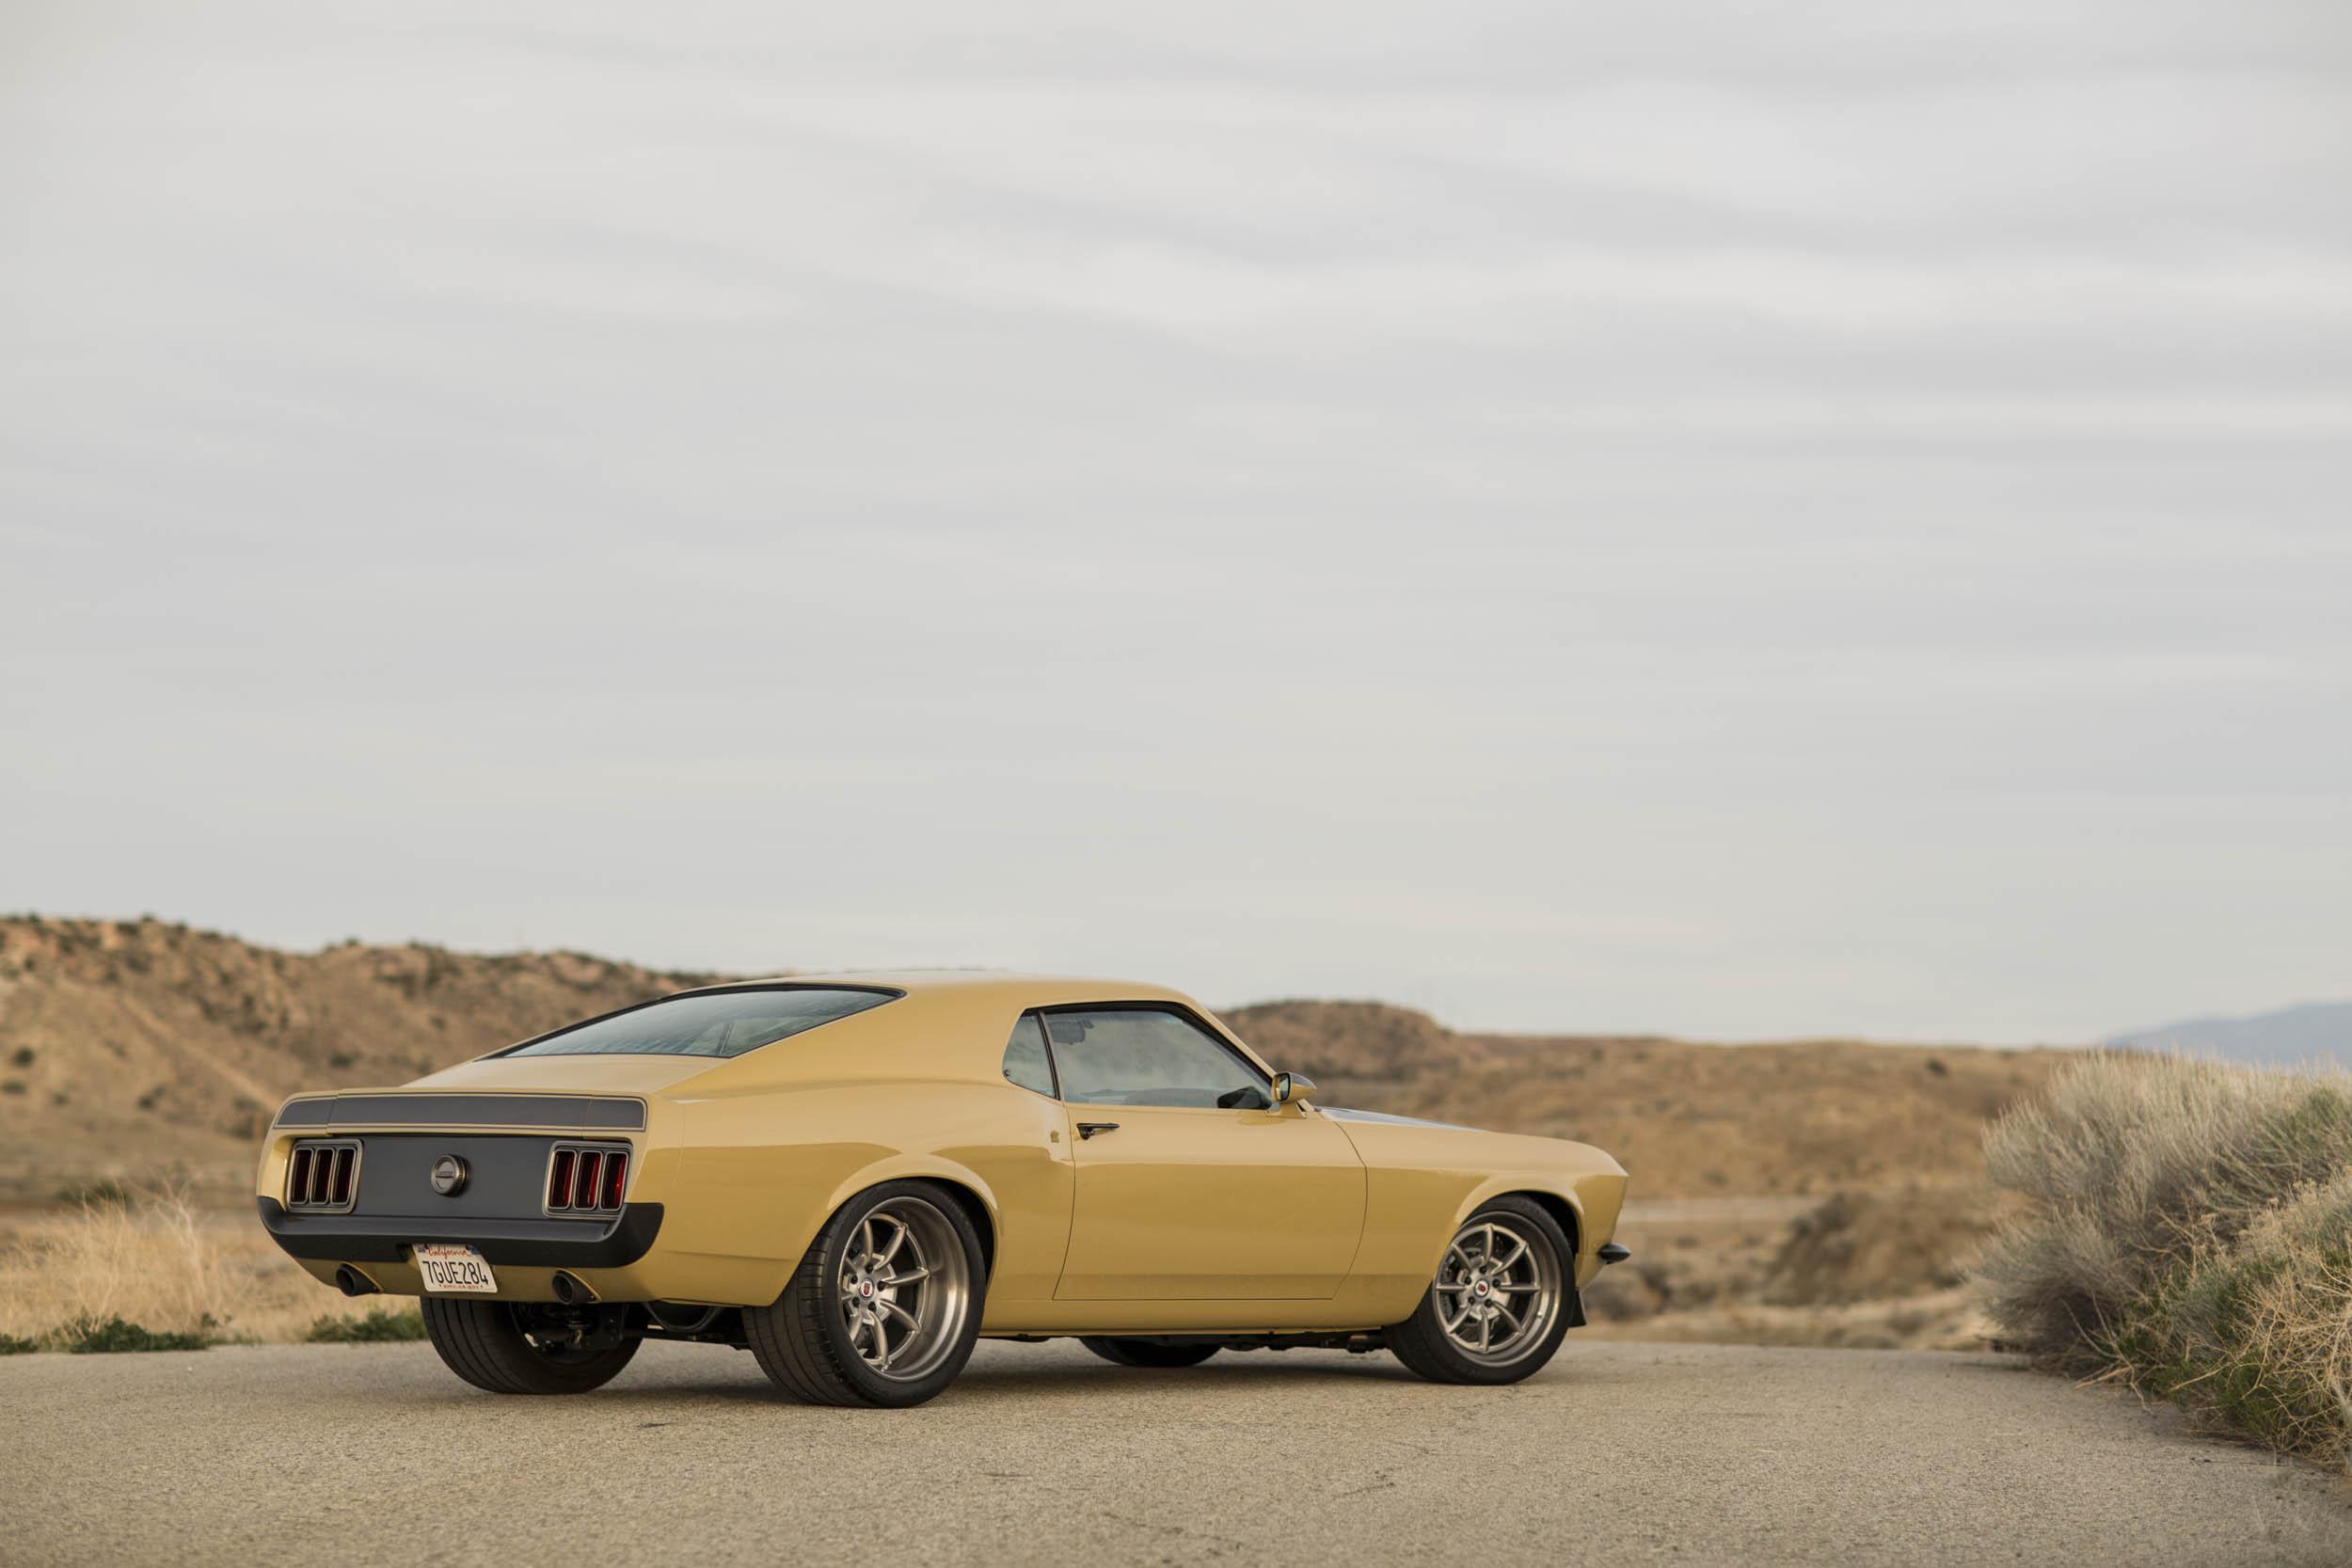 Robert Downey Jr.'s Speedkore 1970 Mustang rear 3/4